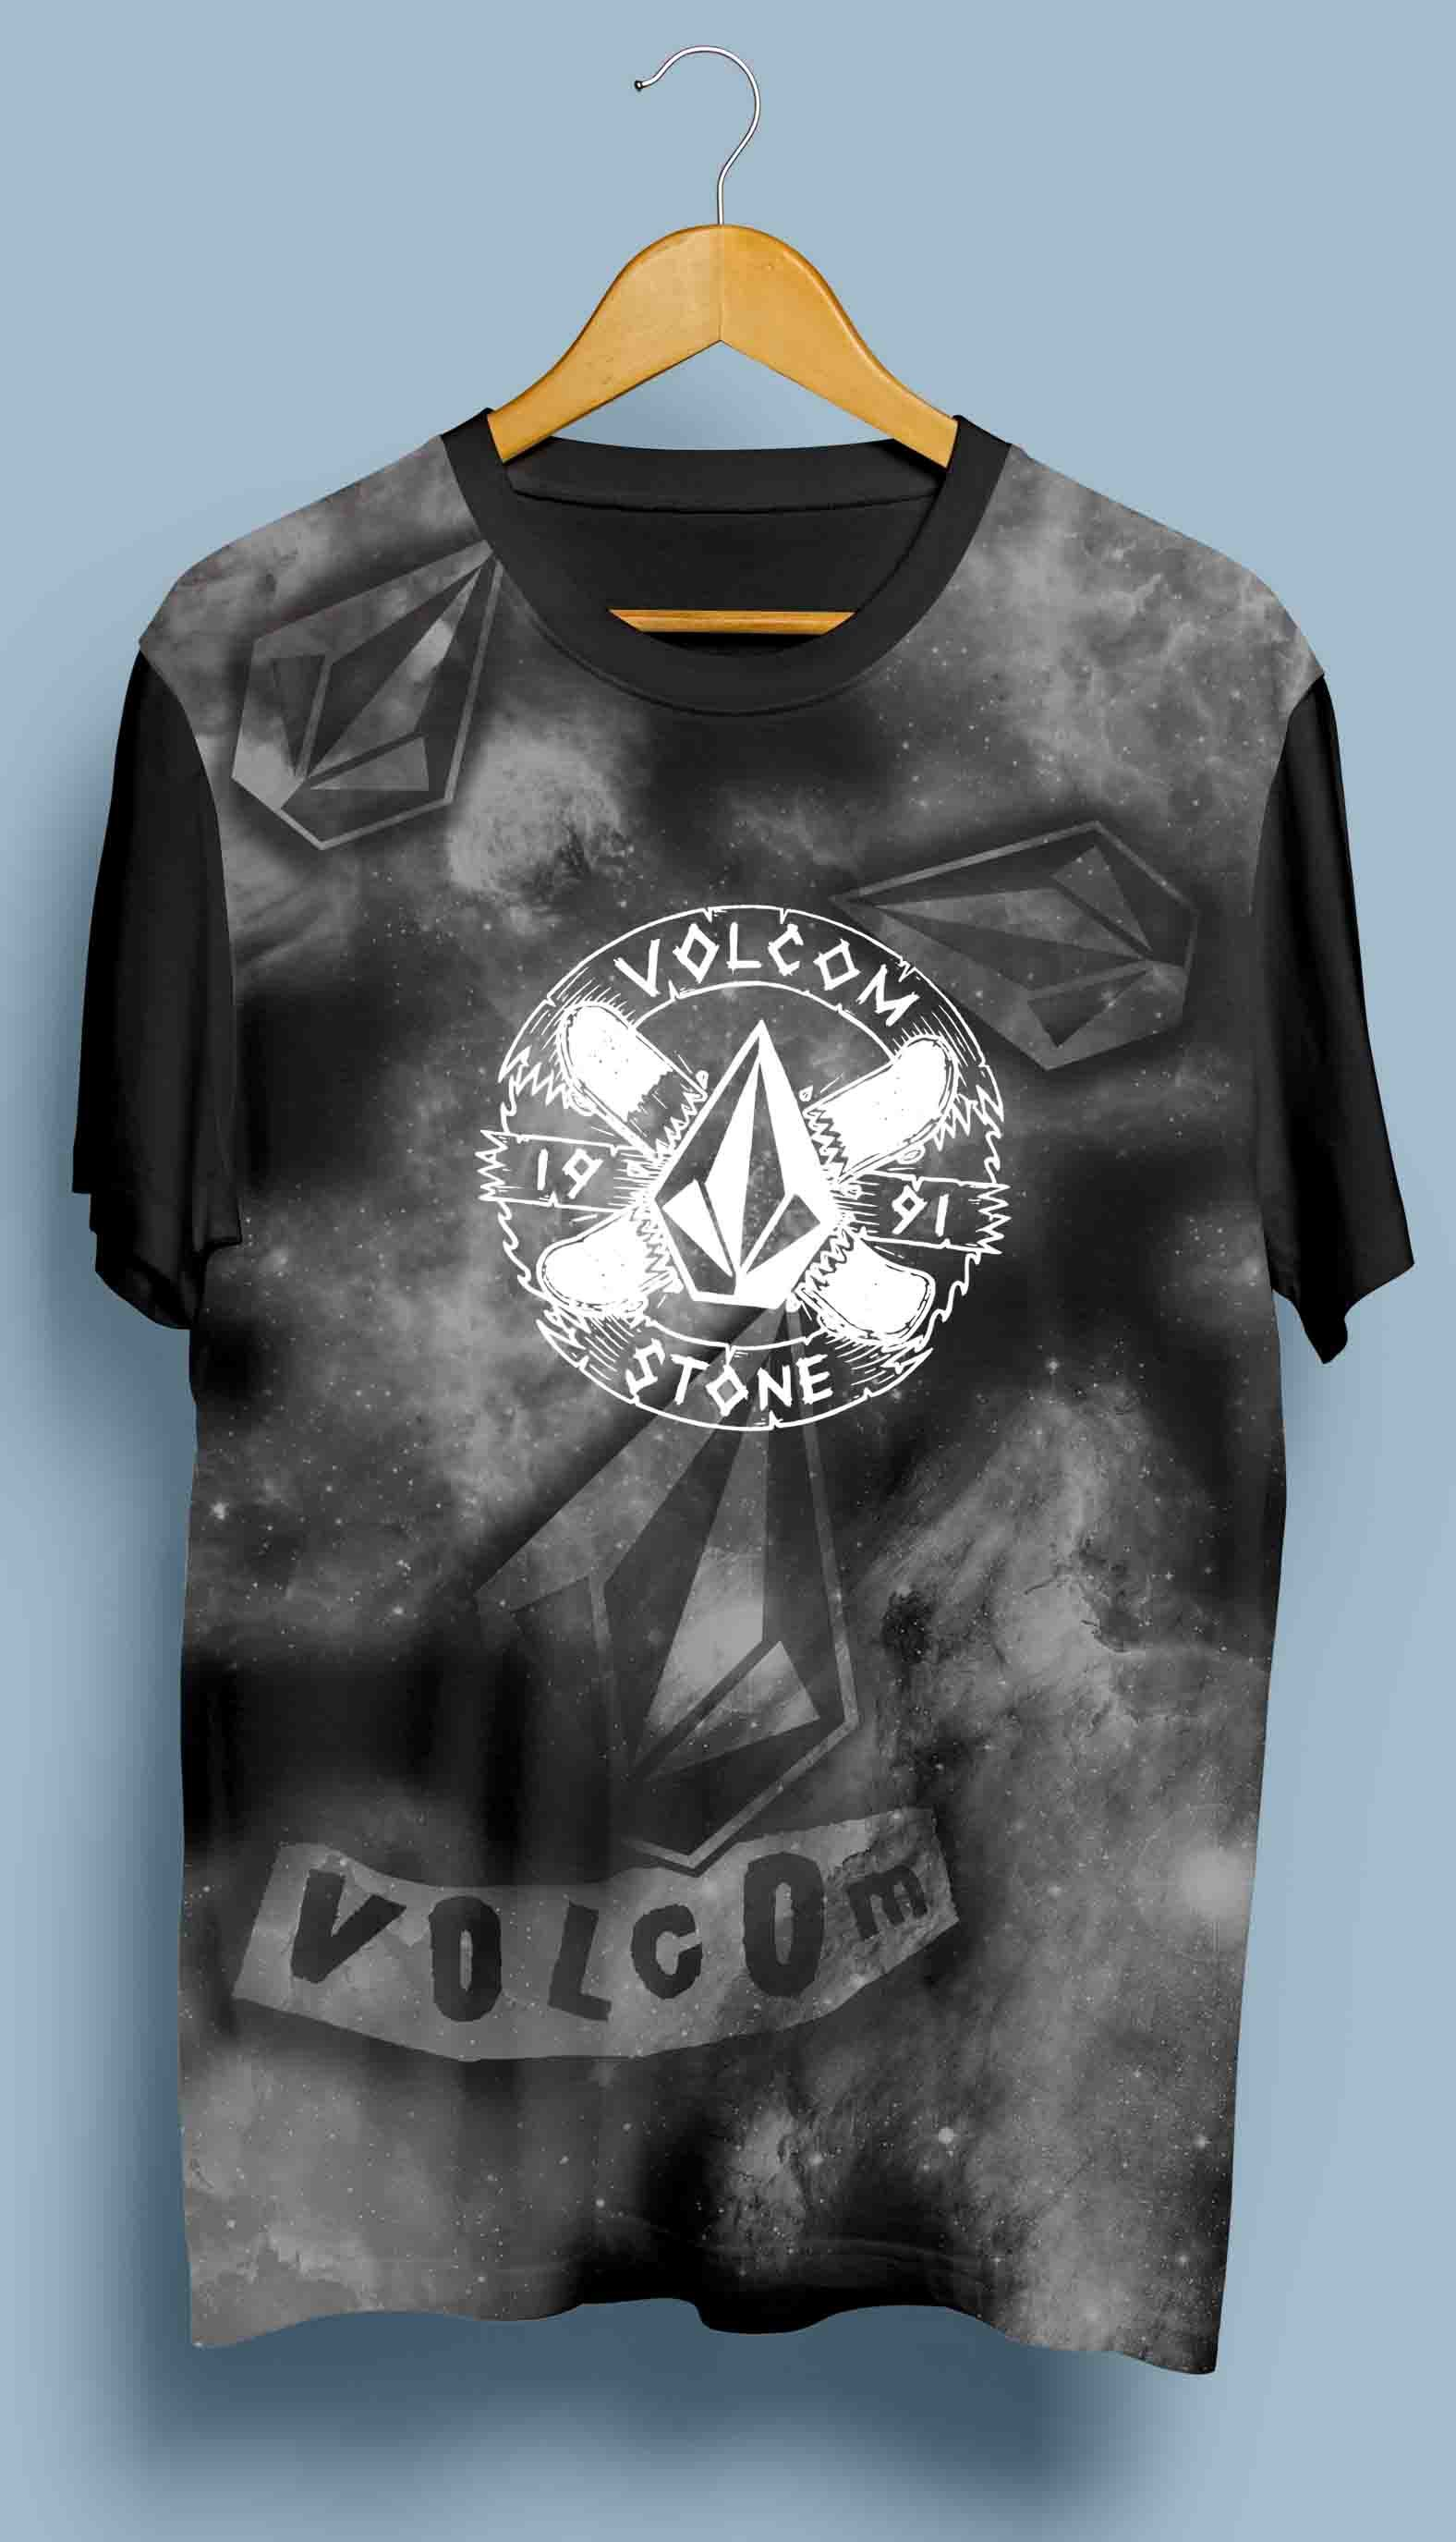 Tees Volcom Surf Tees Dc T Shirtdesign Dcshoecousa T Shirtdc